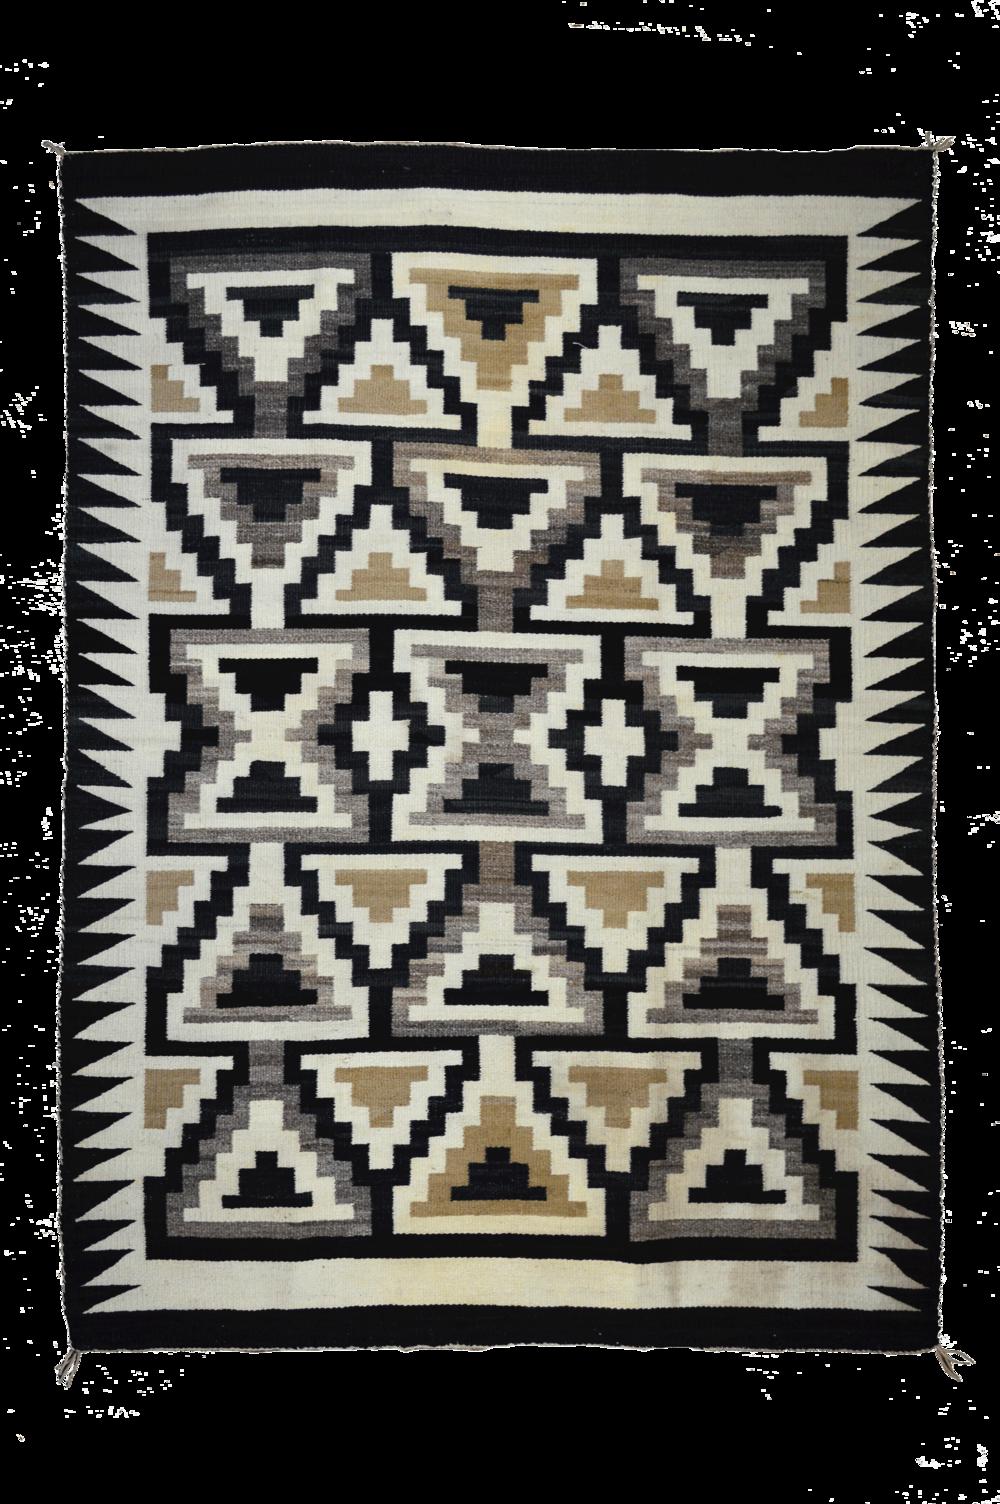 "Old Crystal Trading Post Style Navajo Floor Rug Handspun Natural Wools -c.1910 60"" x 45"" // BV0438"